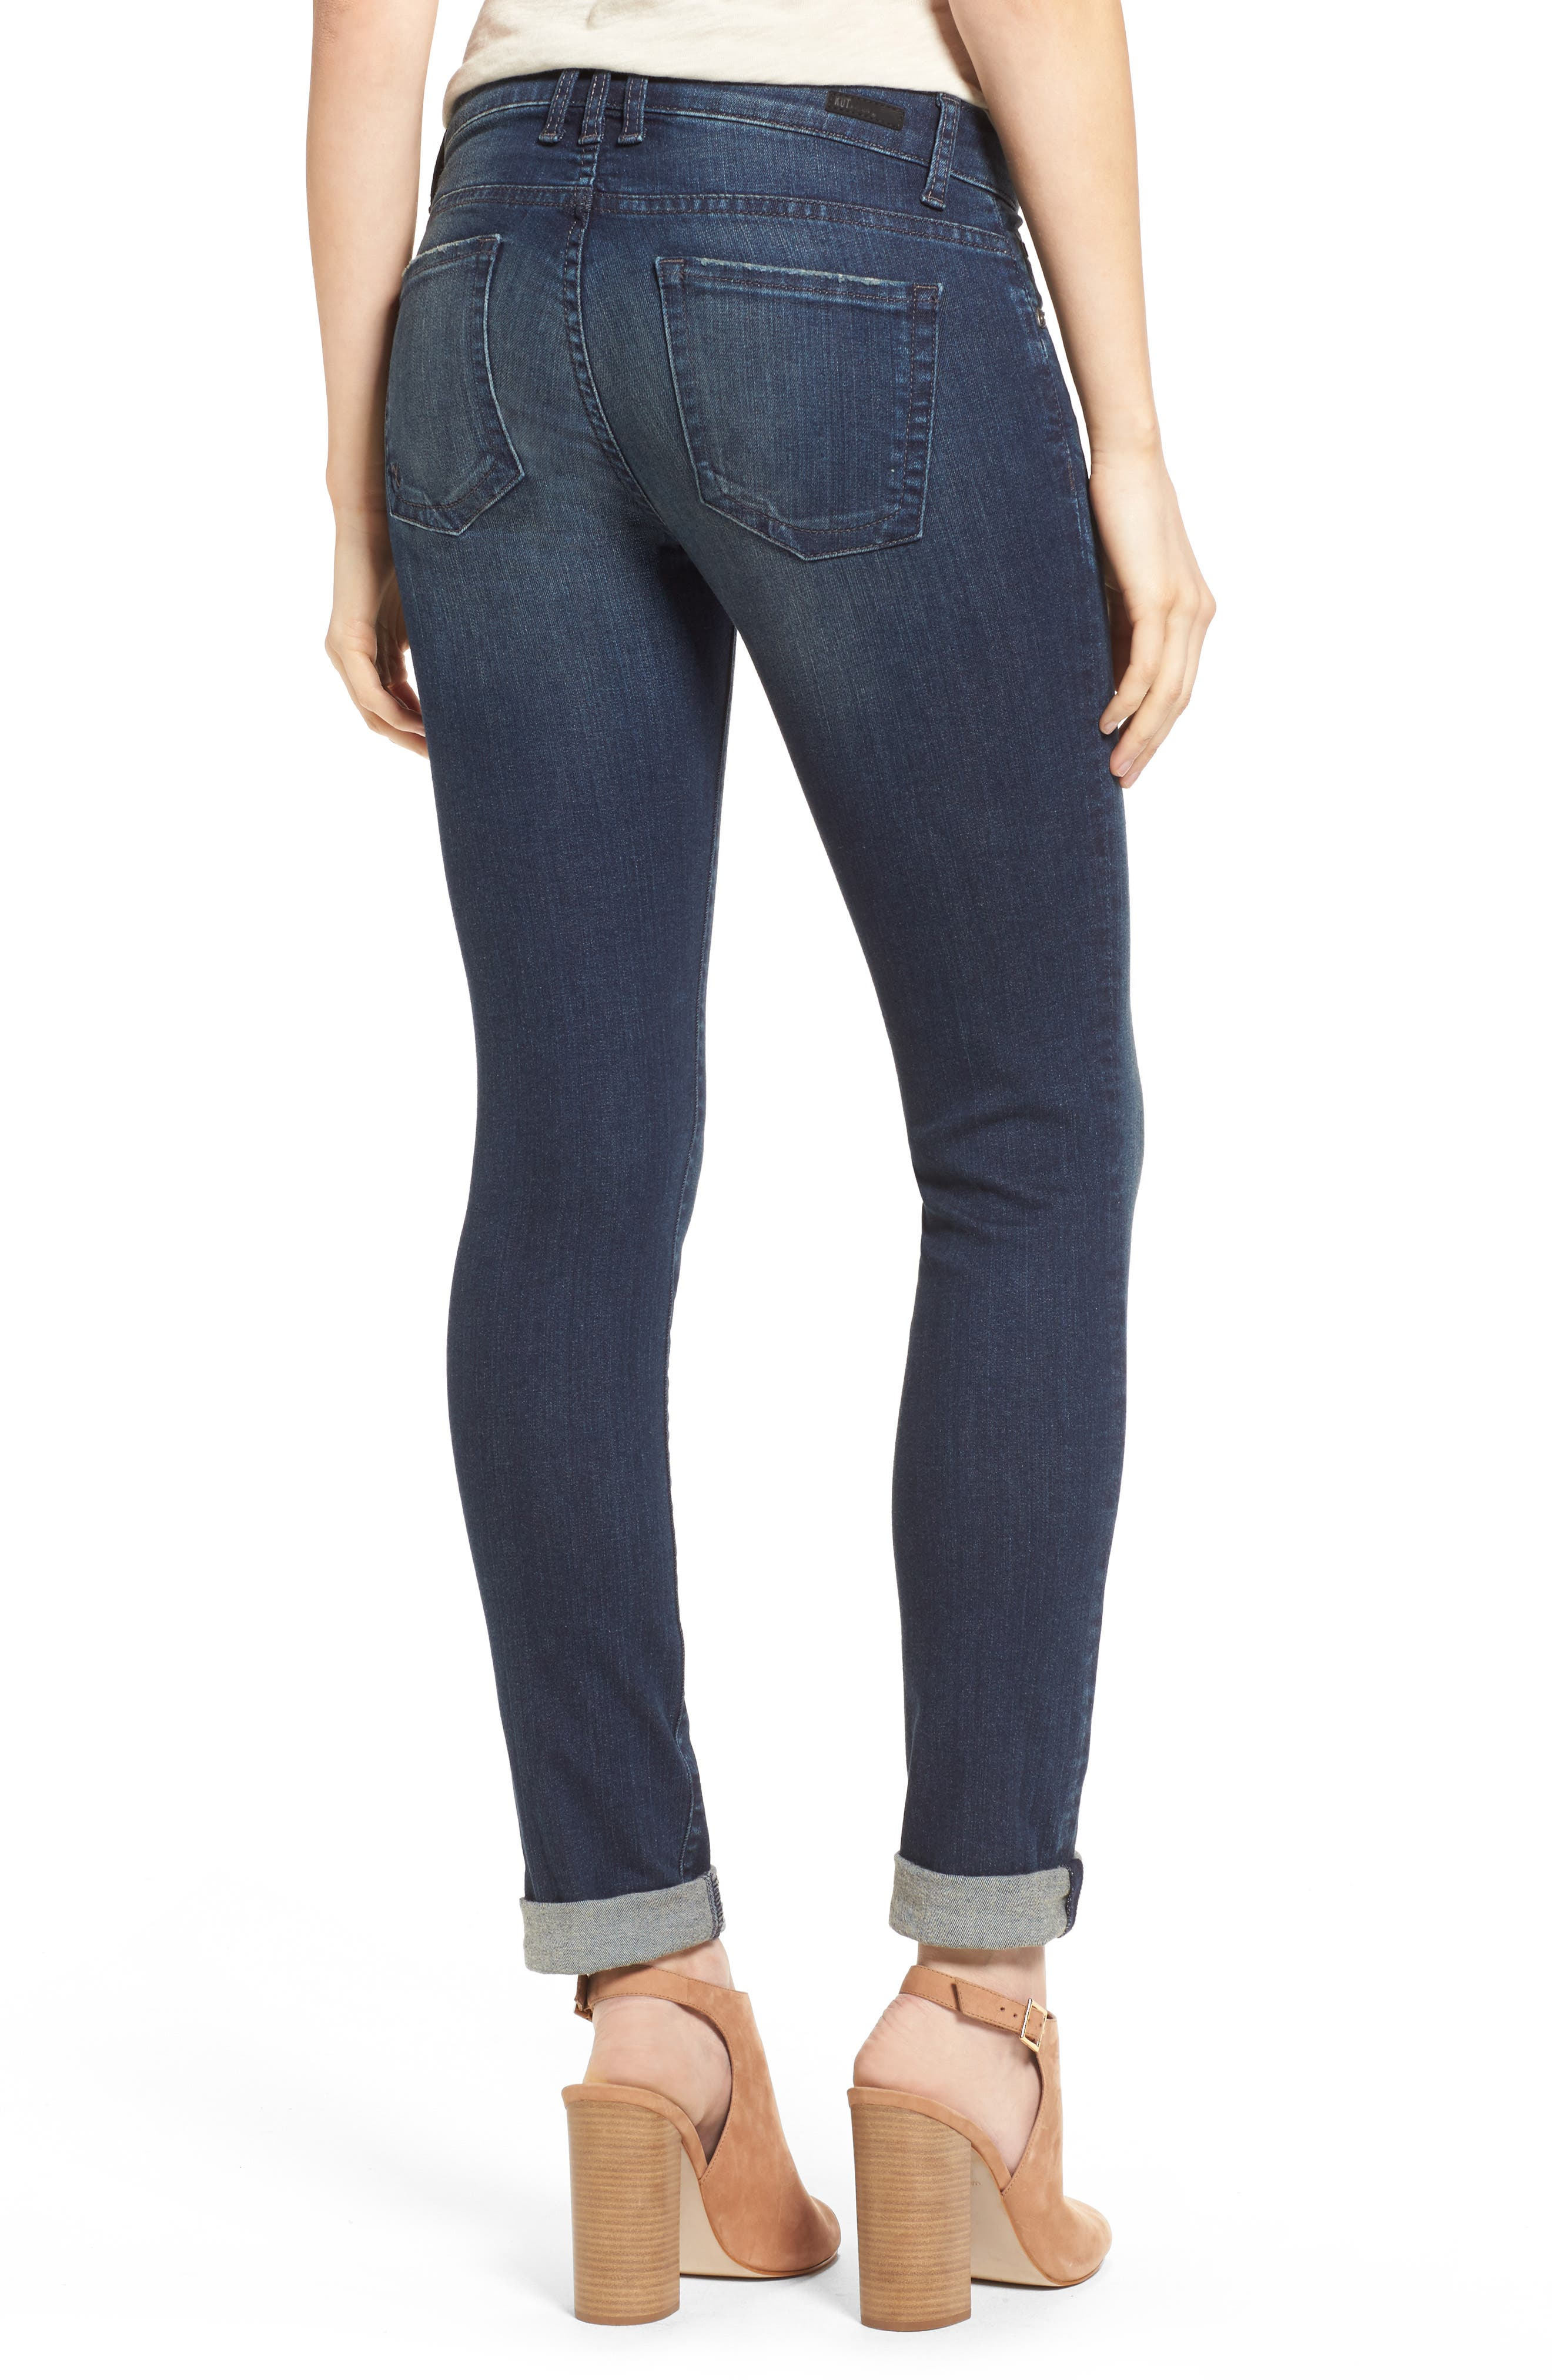 KUT FROM THE KLOTH 'Catherine' Slim Boyfriend Jeans, Main, color, CAREFULNESS